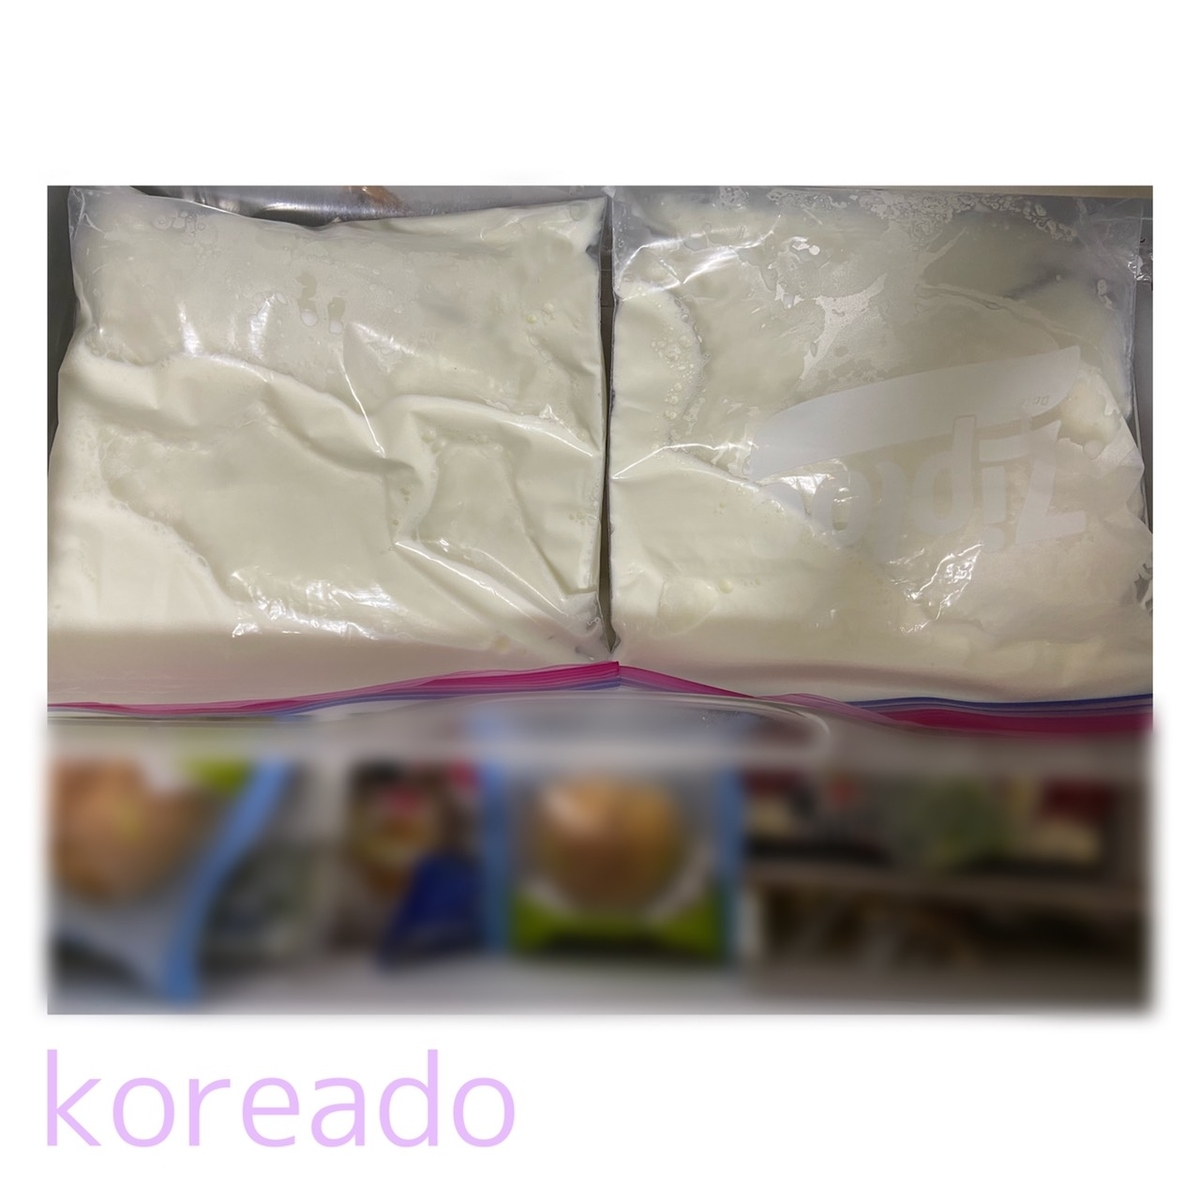 f:id:i-love-korea:20200802211905j:plain